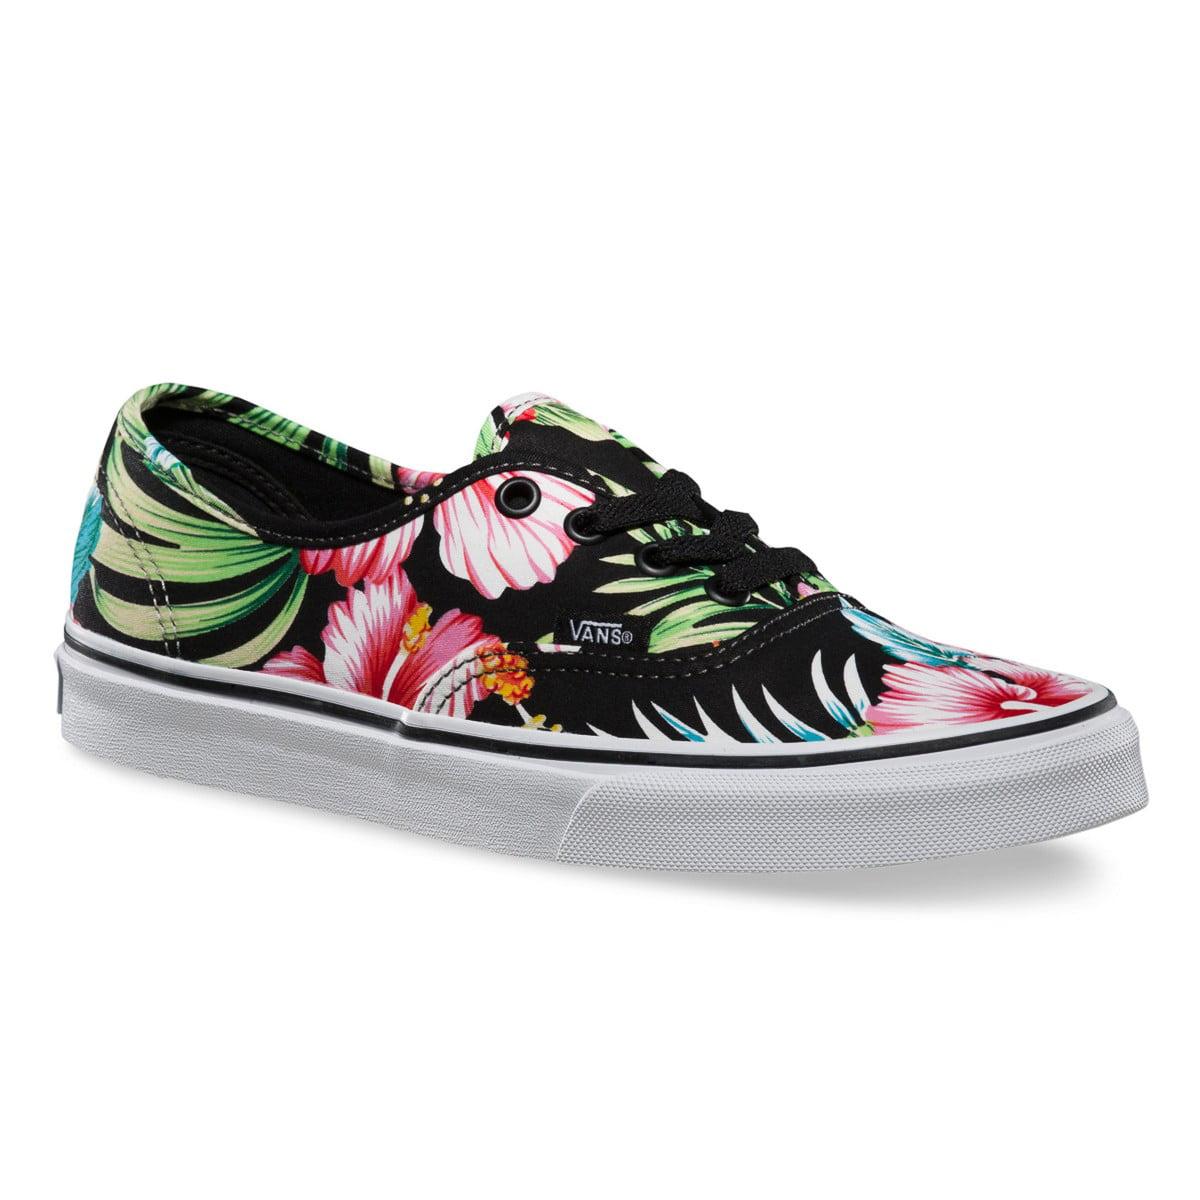 "Van/'s Toddler/'s Shoes /""Authentic/"" Blk//TWht - Hawaiian Floral"